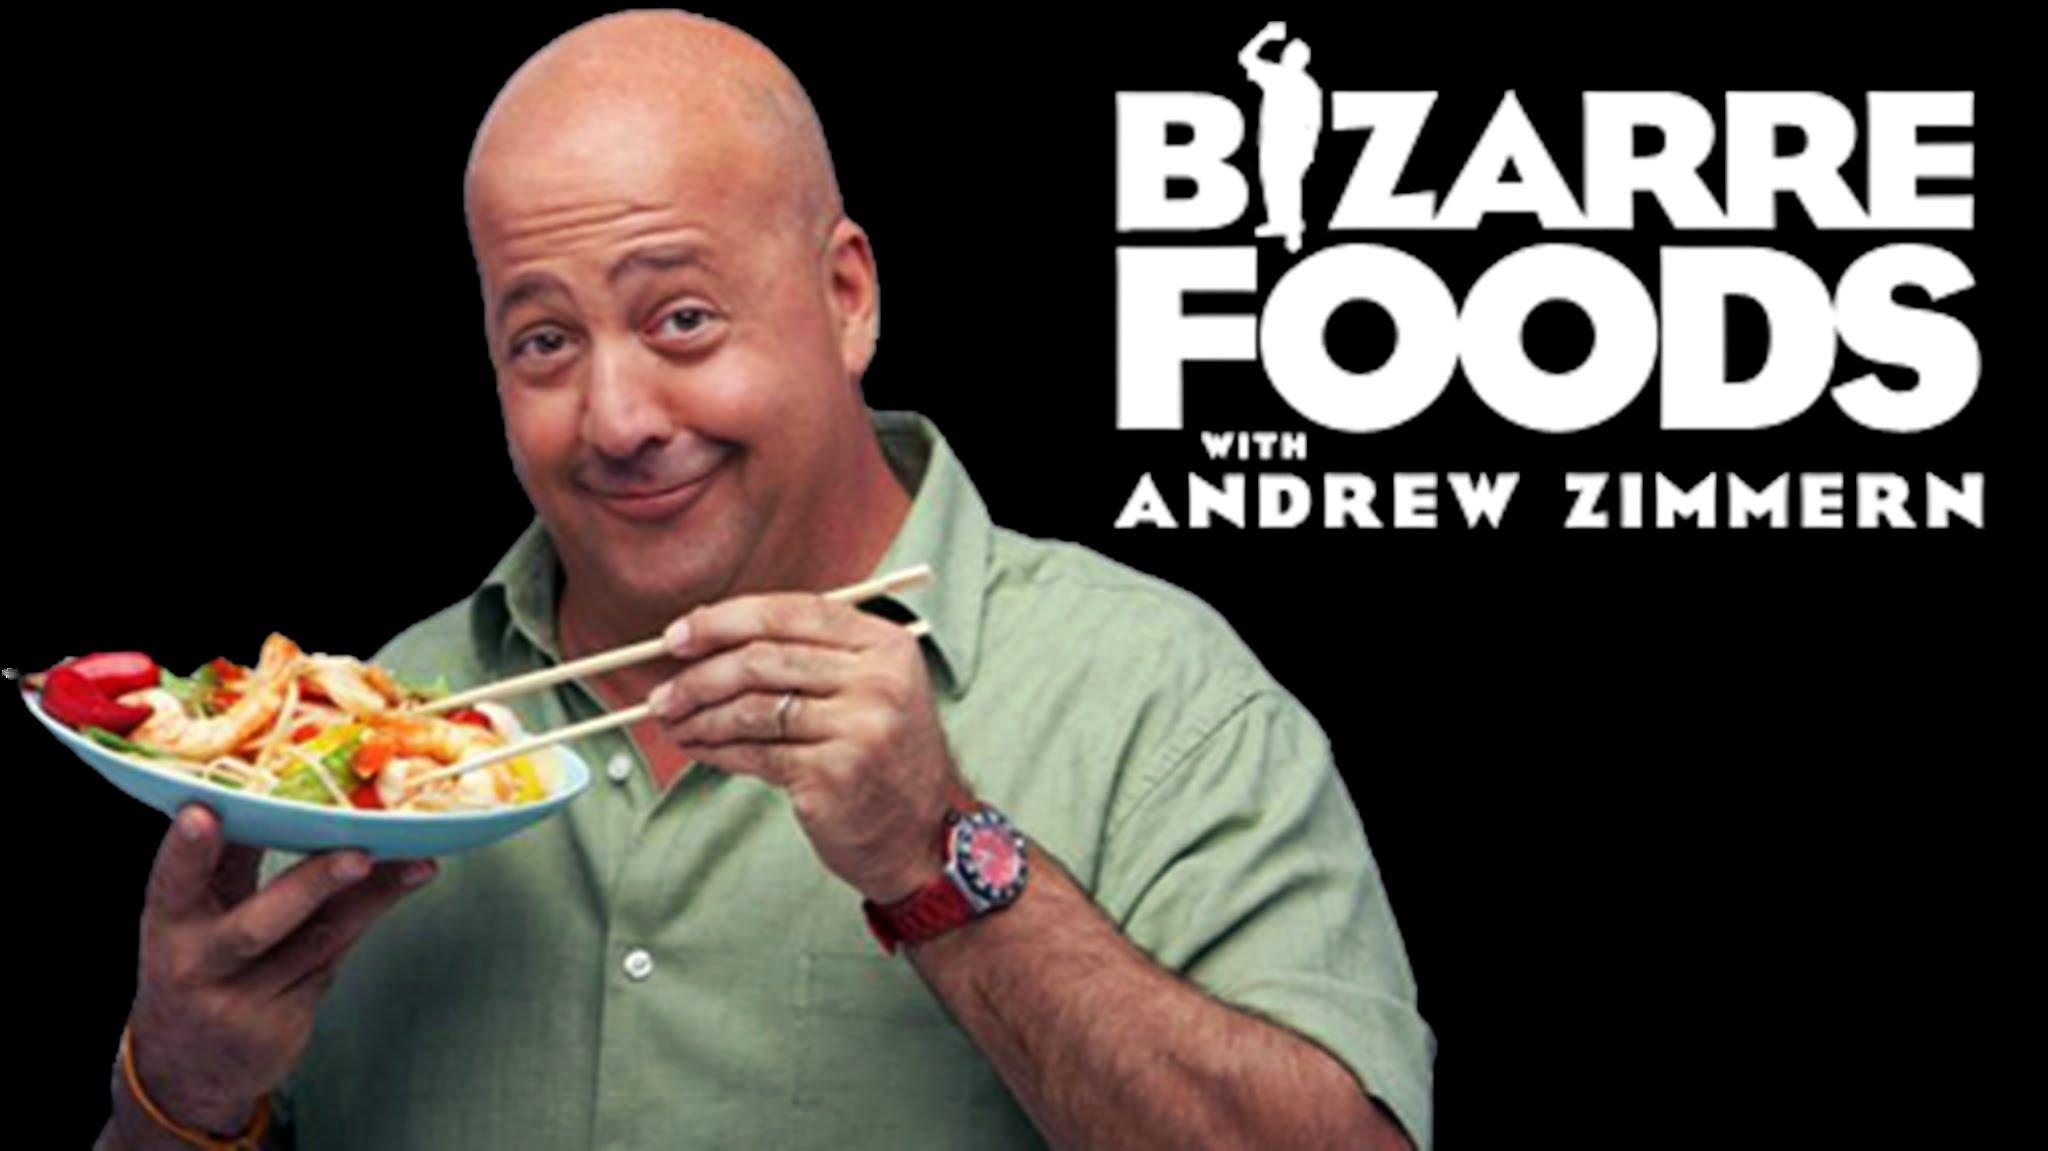 Bizarre Foods With Andrew Zimmern: Season 14